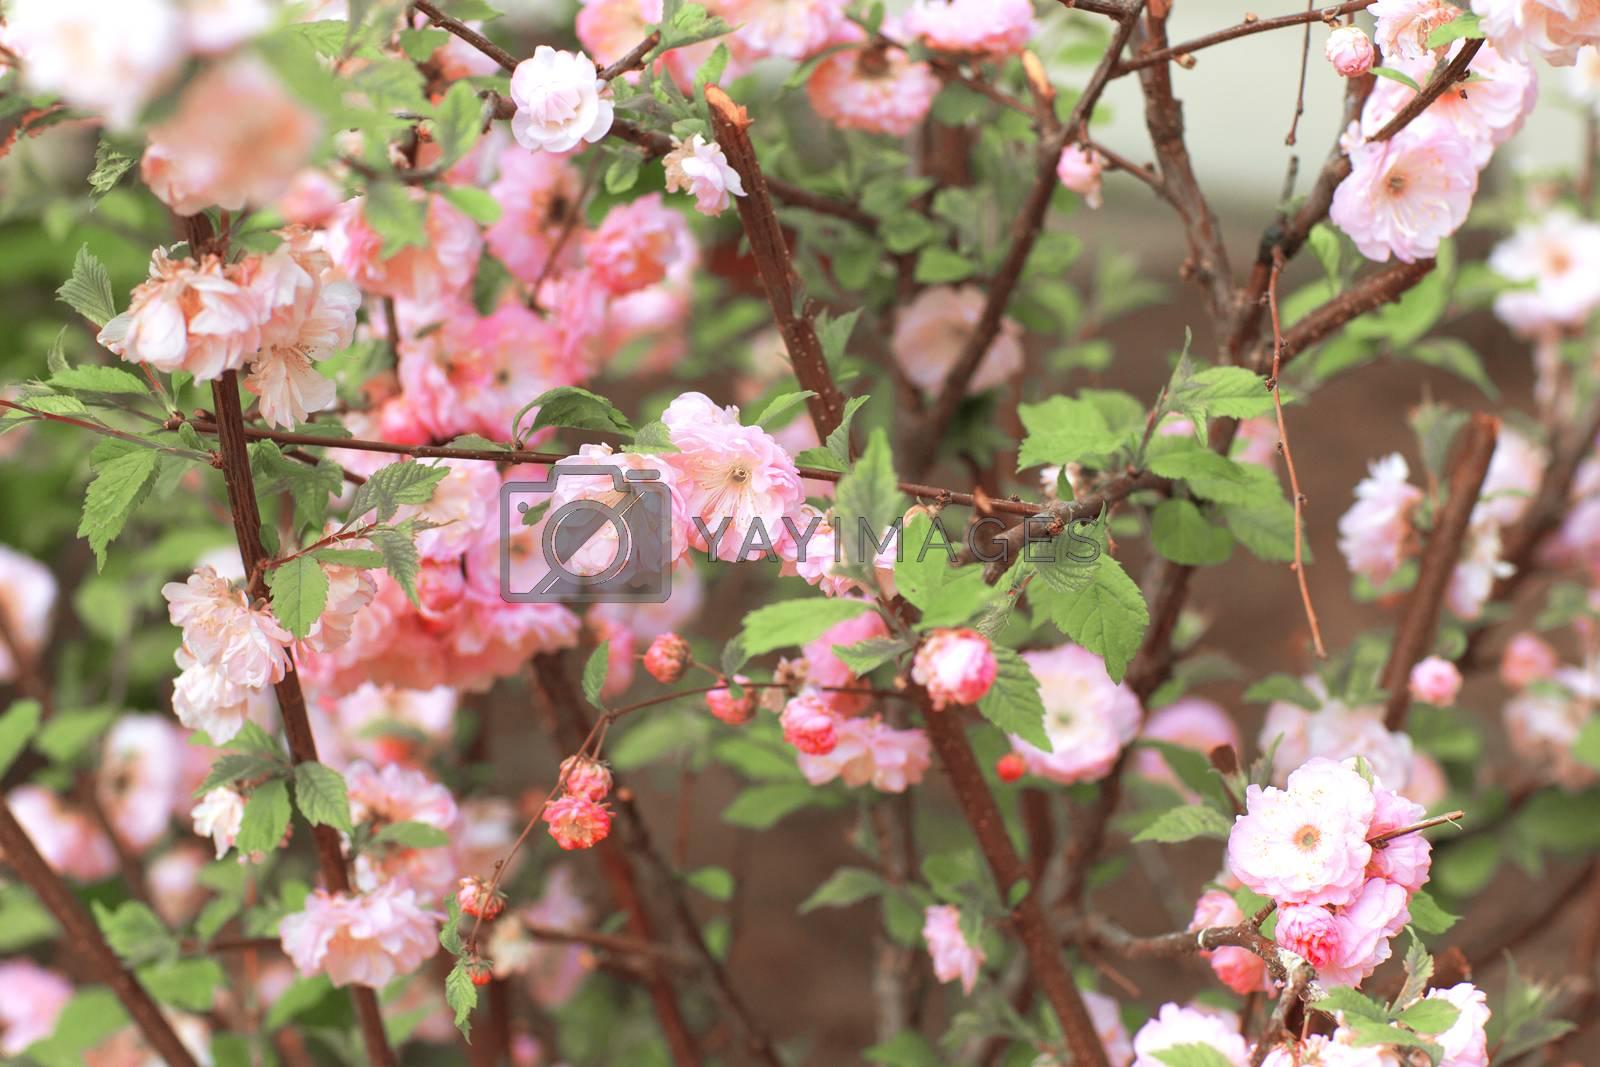 pink flowers on bush - background